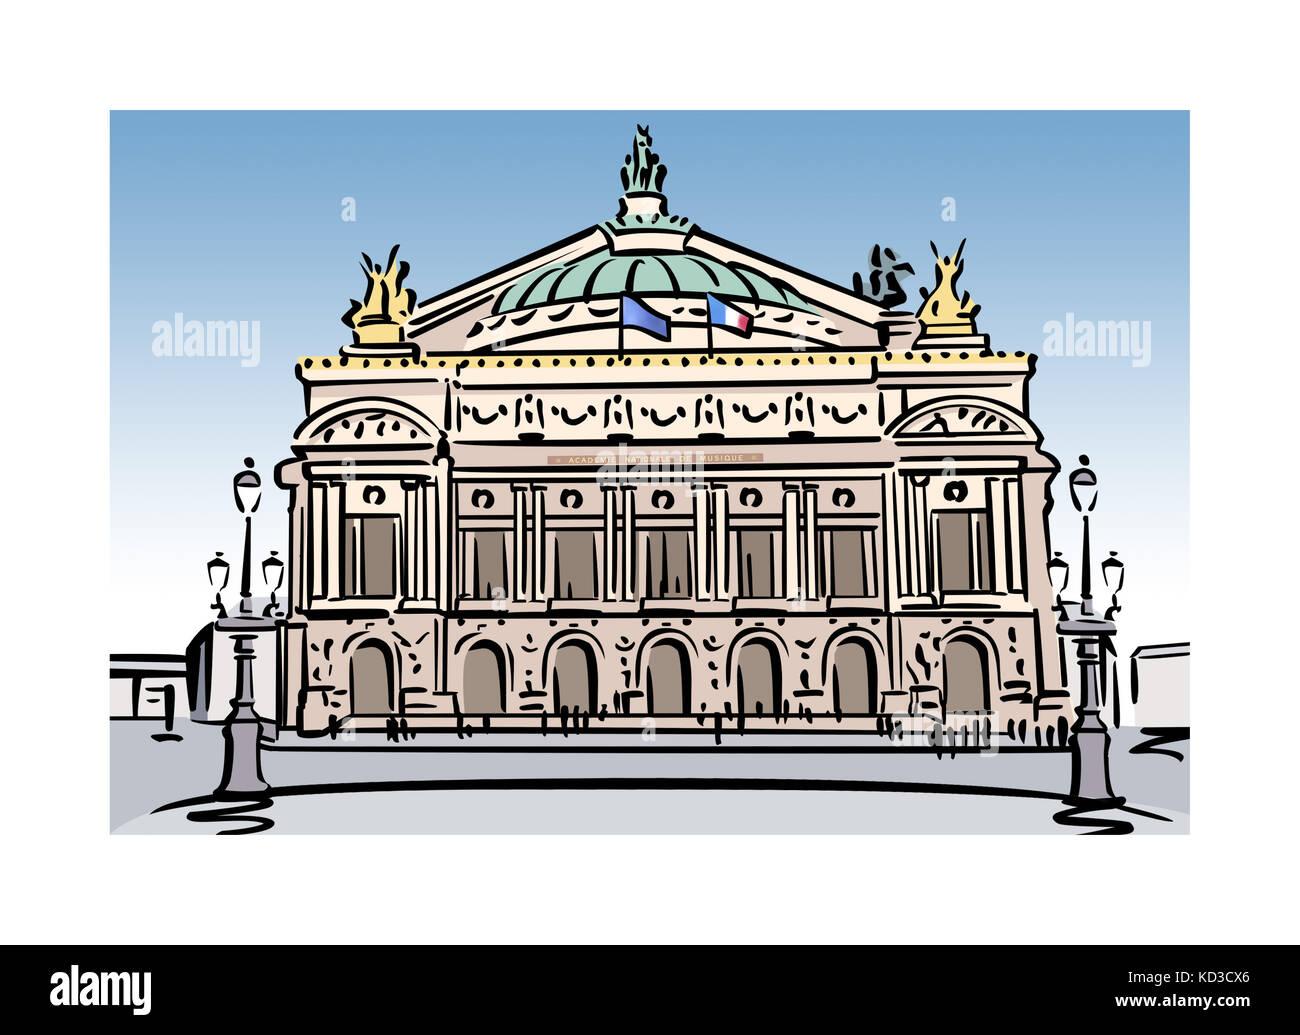 Illustration of the Opera Garnier in Paris, France - Stock Image